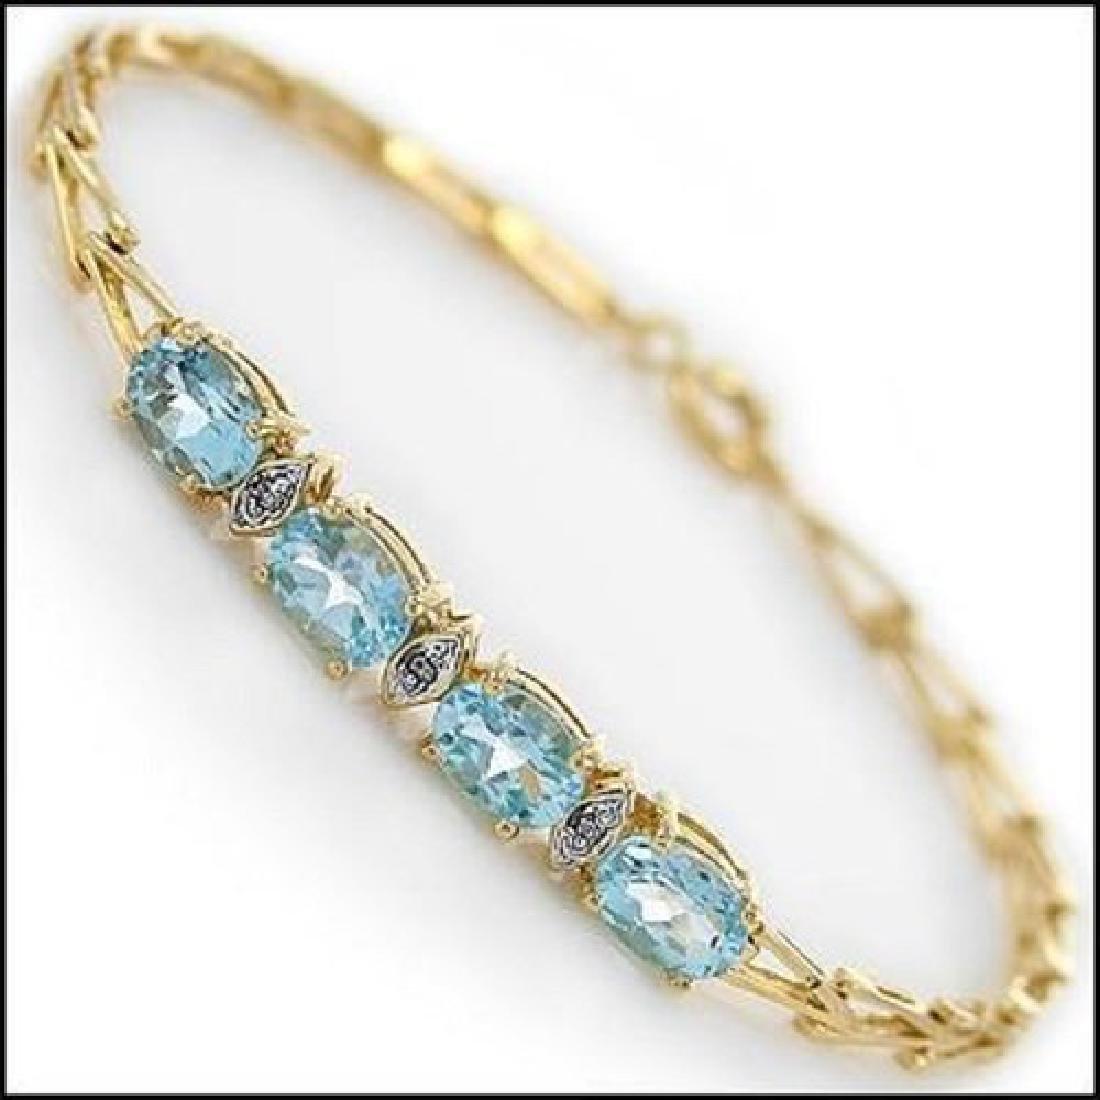 4.29 Ct Blue Topaz Diamond Fine Designer Bracelet $990